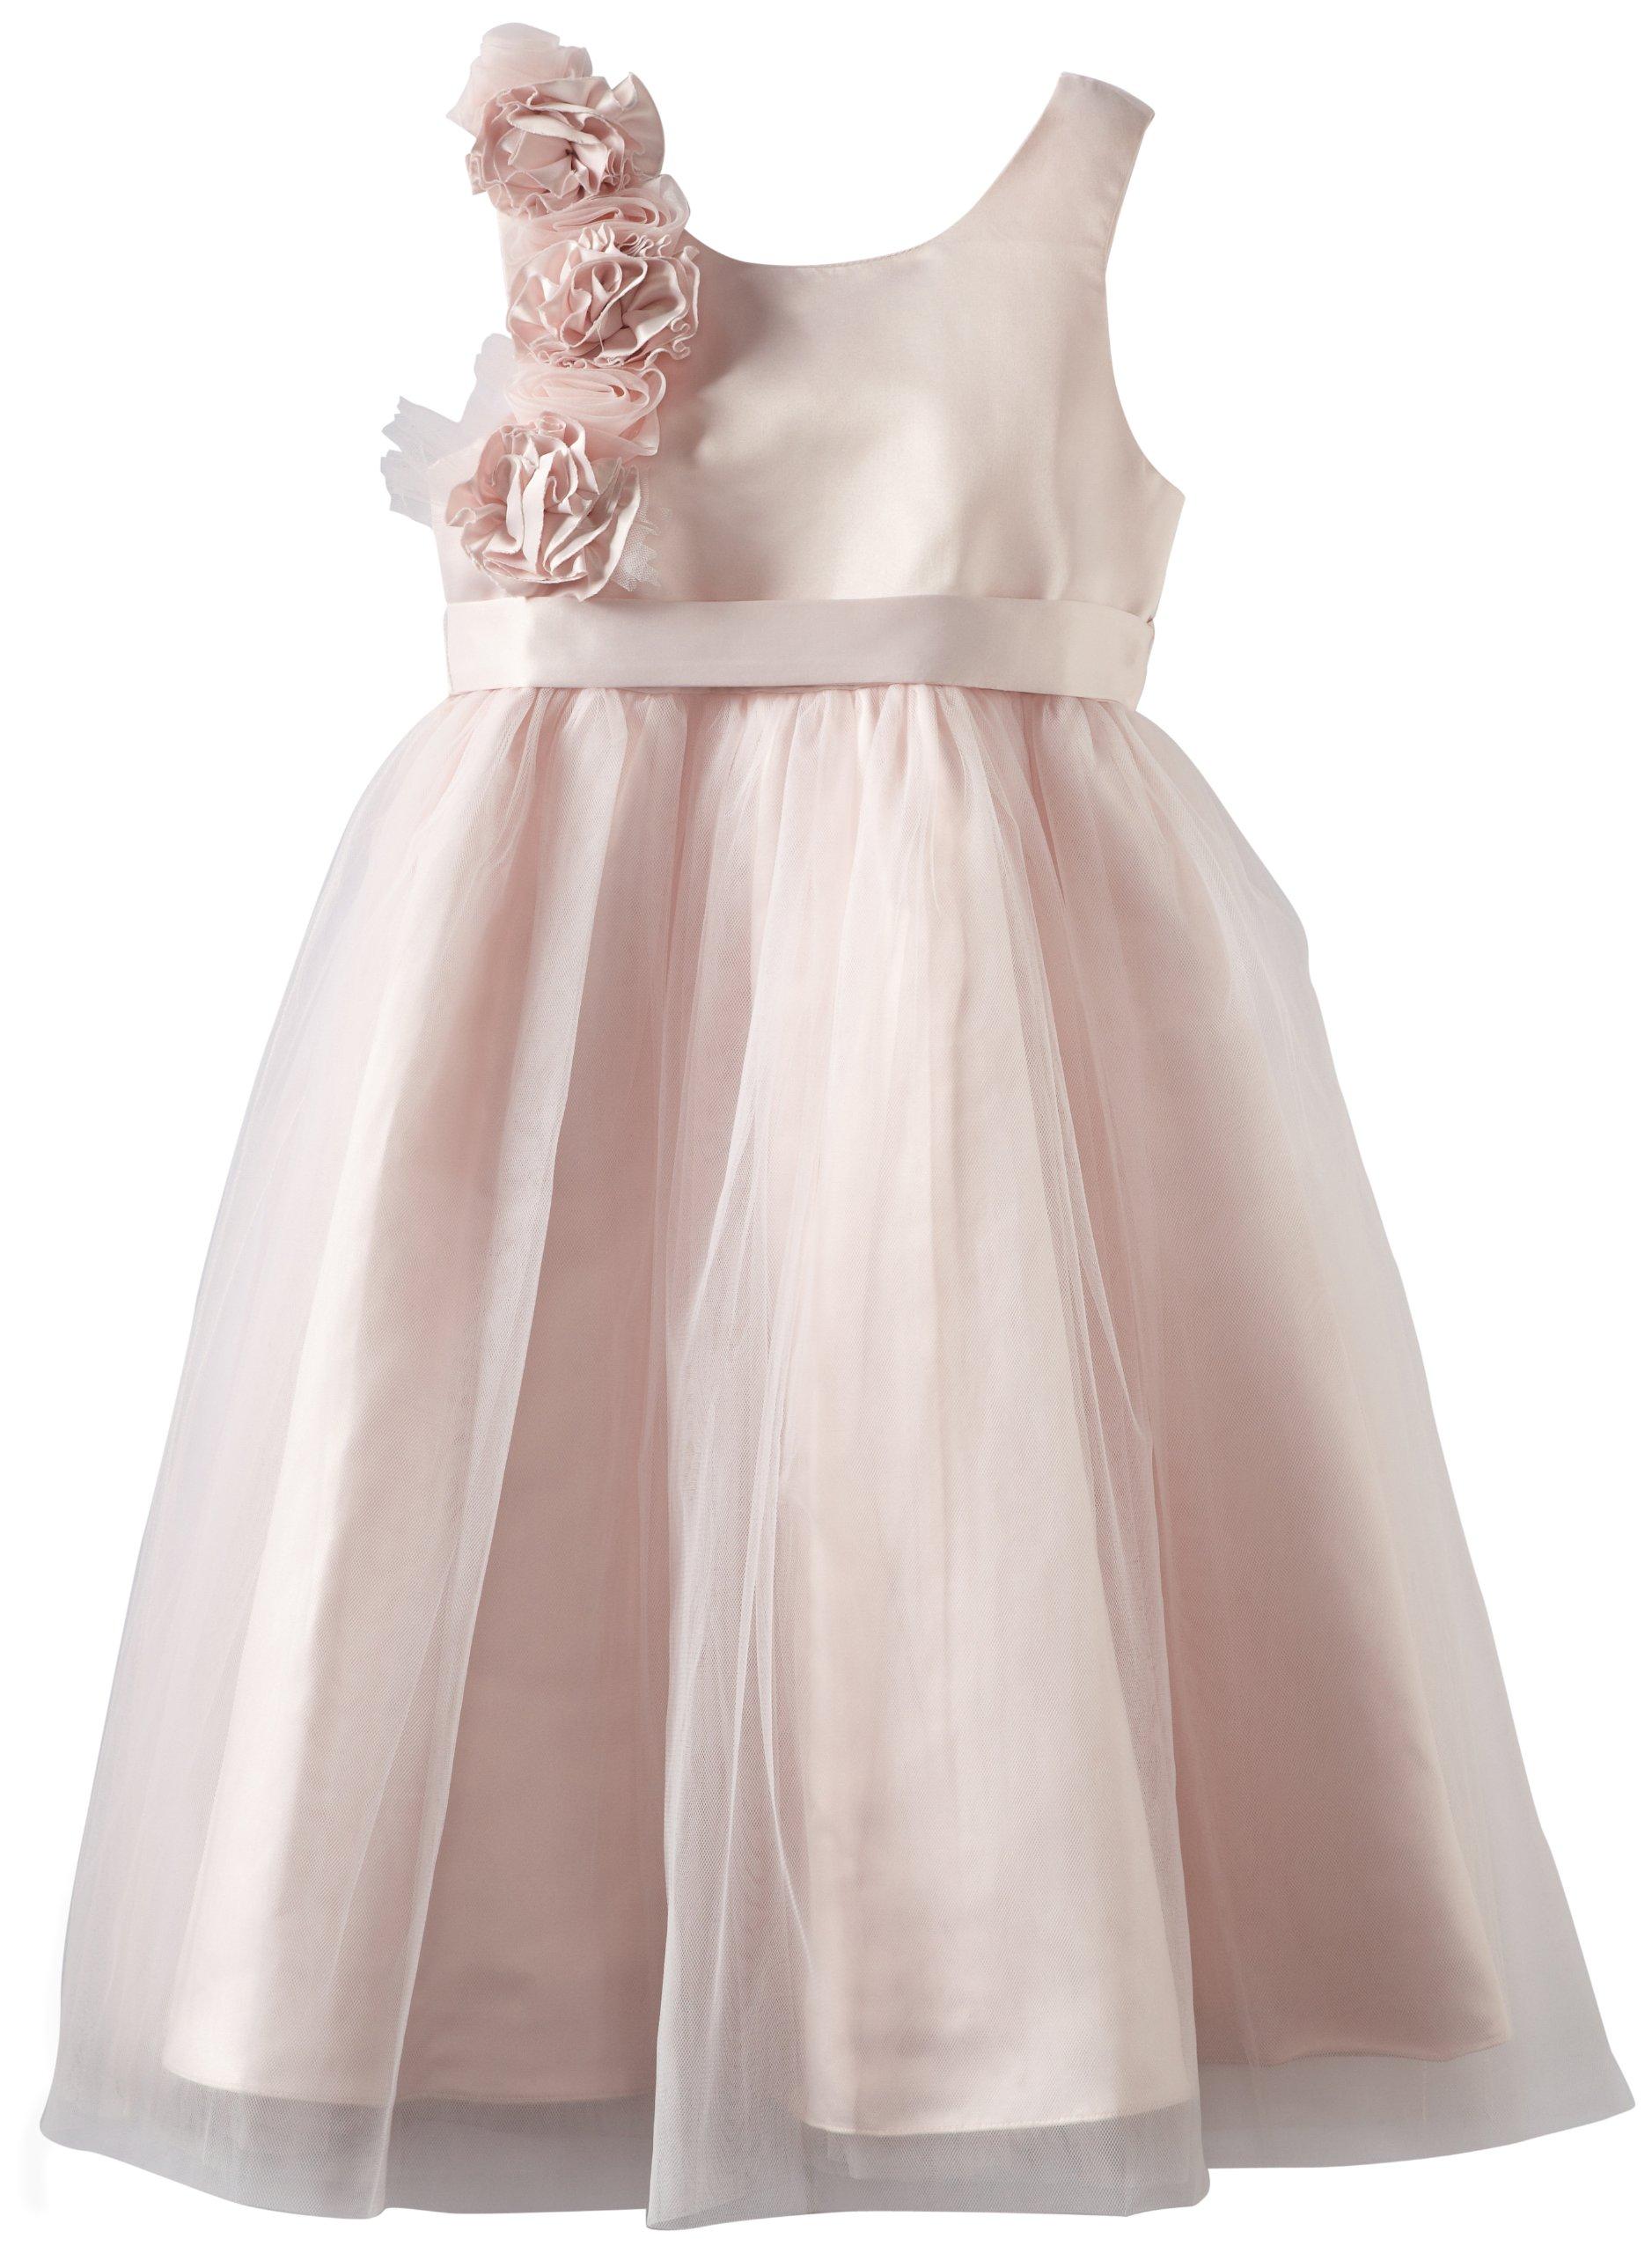 Us Angels Big Girls' Empire Dress, Blush Pink, 14